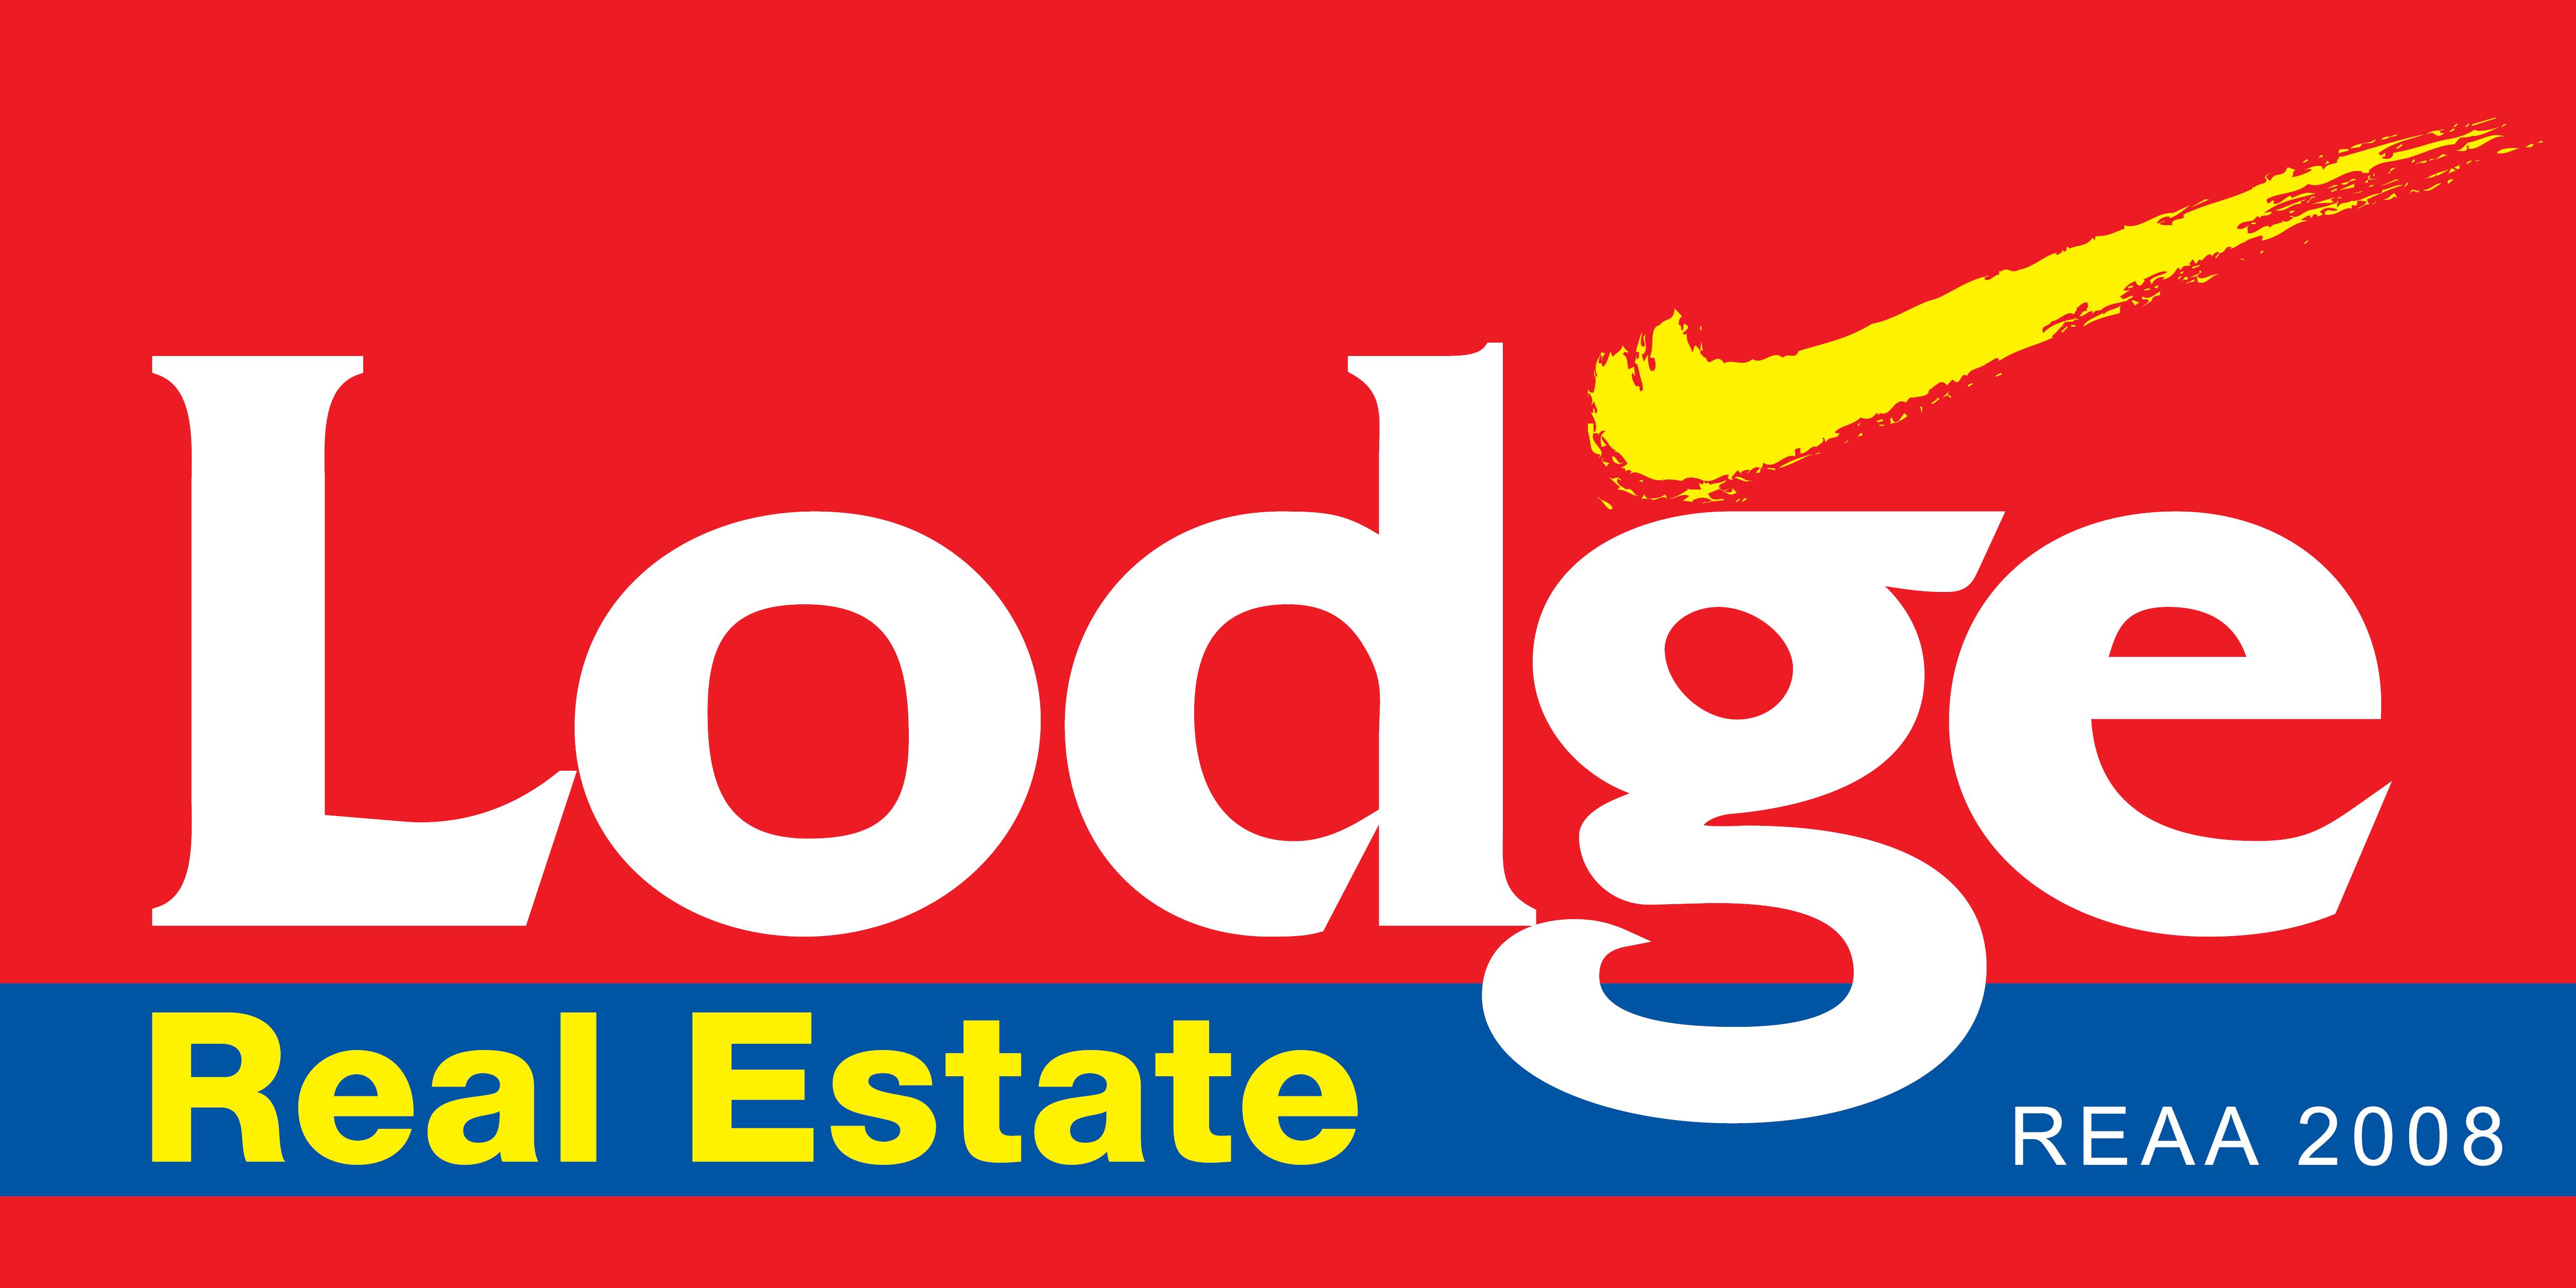 Lodge Real Estate - Dinsdale